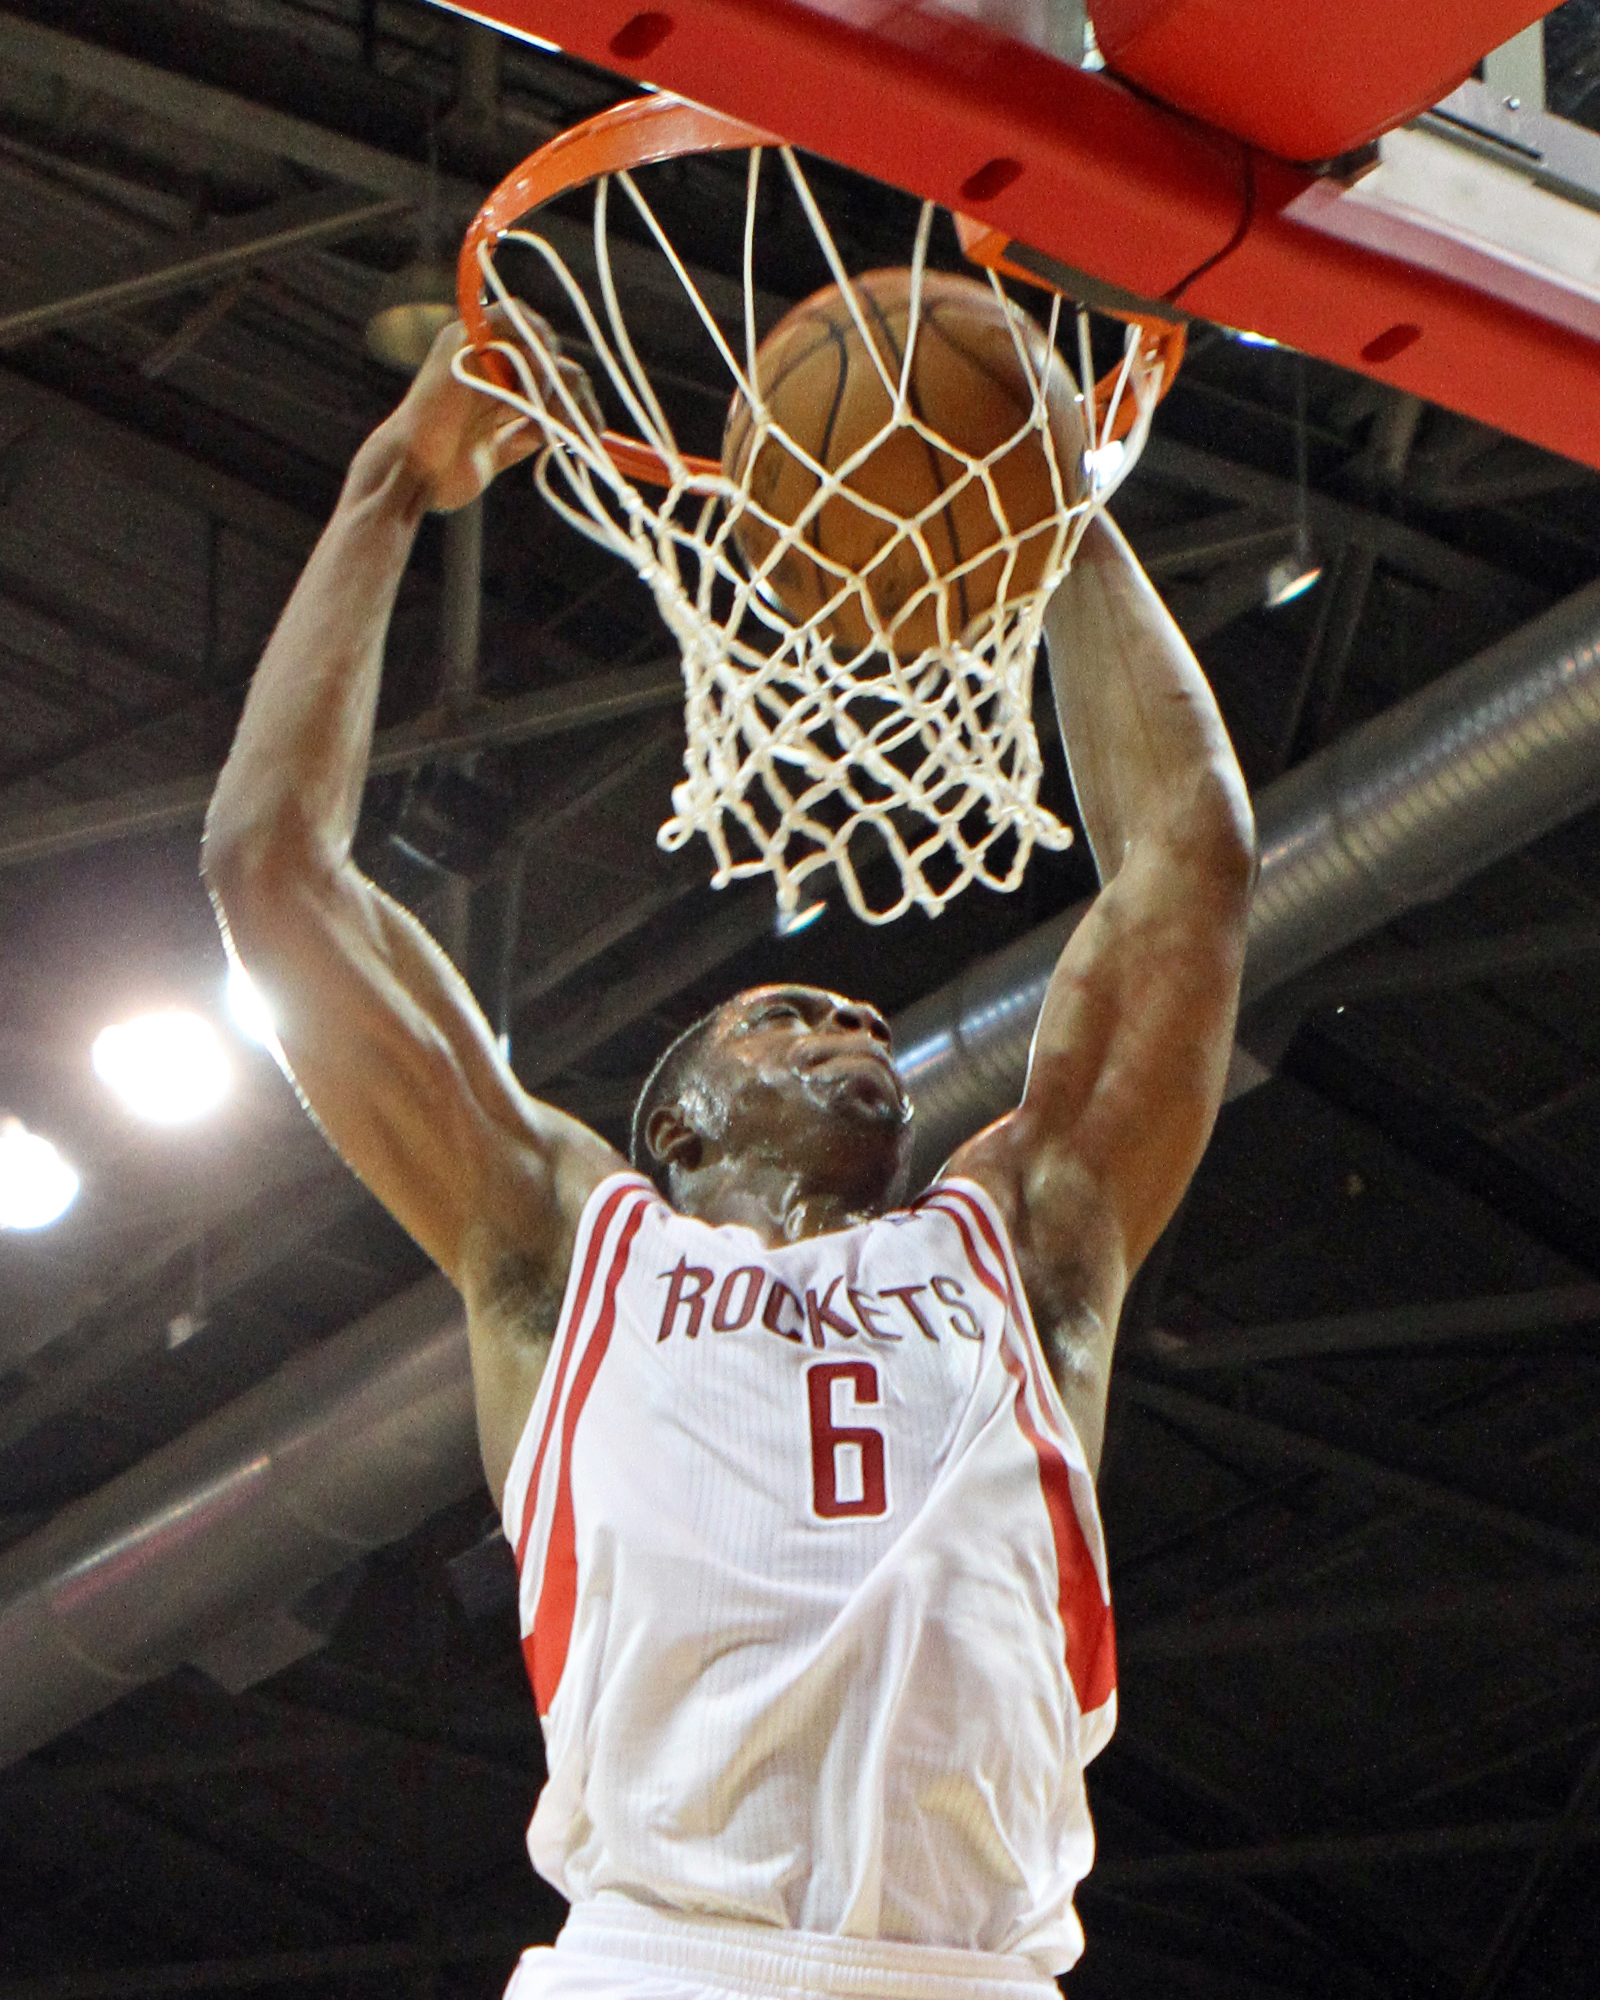 Golden State Warriors Vs Houston Rockets Live Stream Free: 2012 NBA Draft